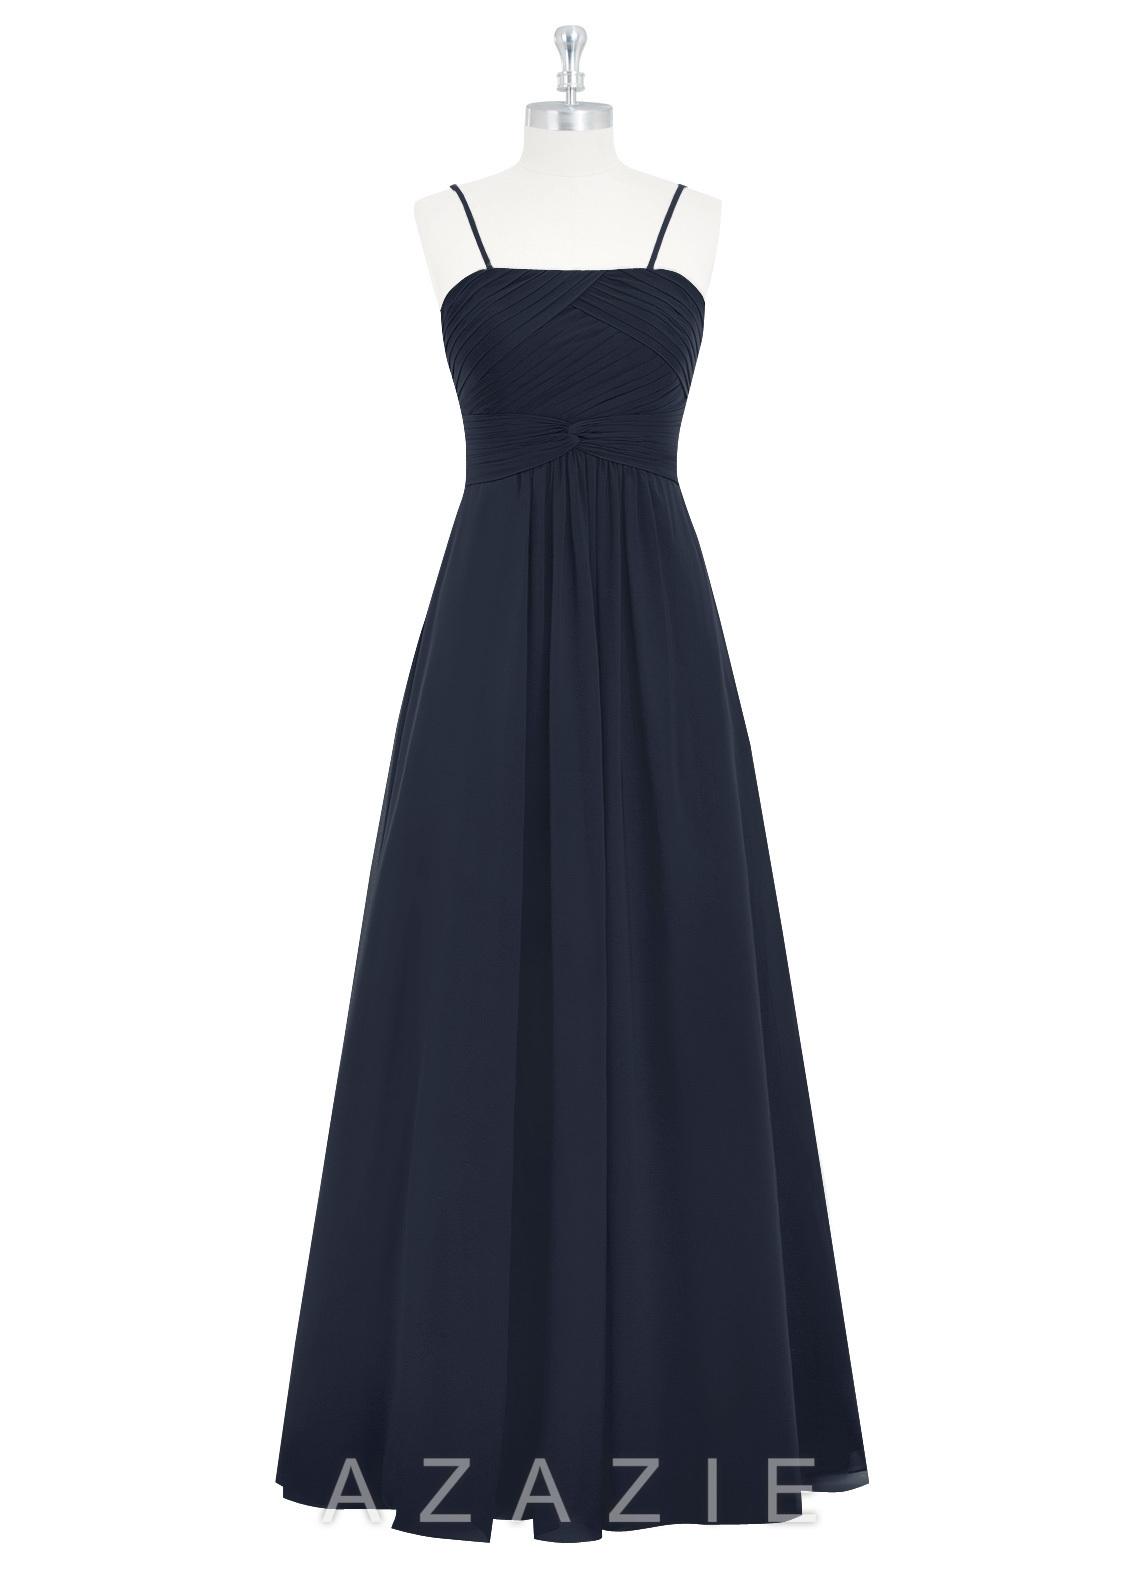 c5ce6146abc Azazie Imogene Bridesmaid Dresses